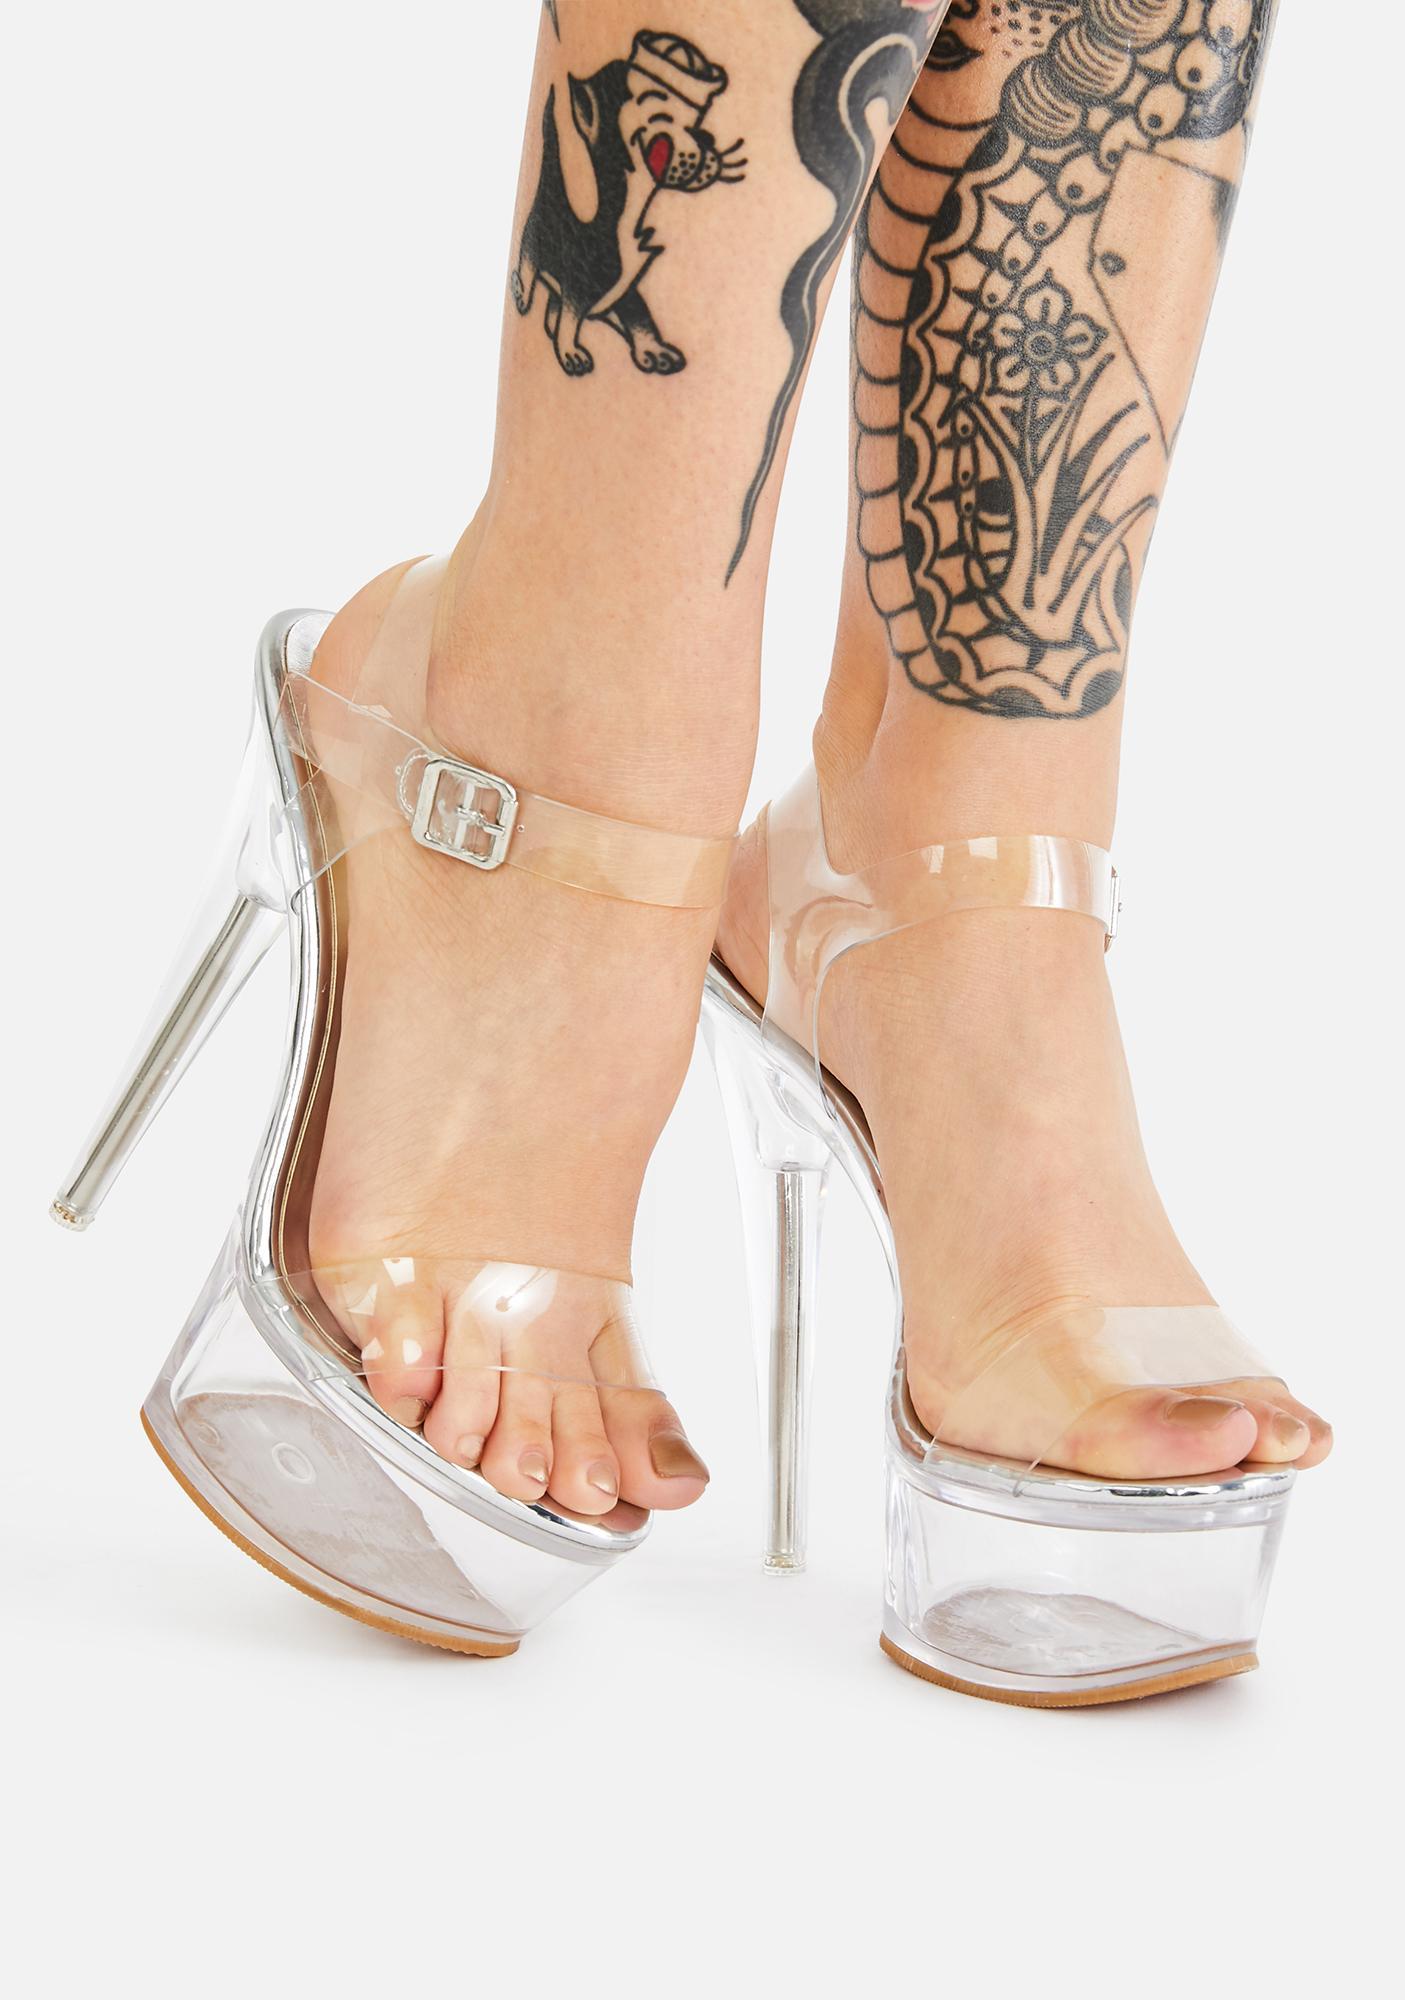 AZALEA WANG Croix Clear Platform Heels